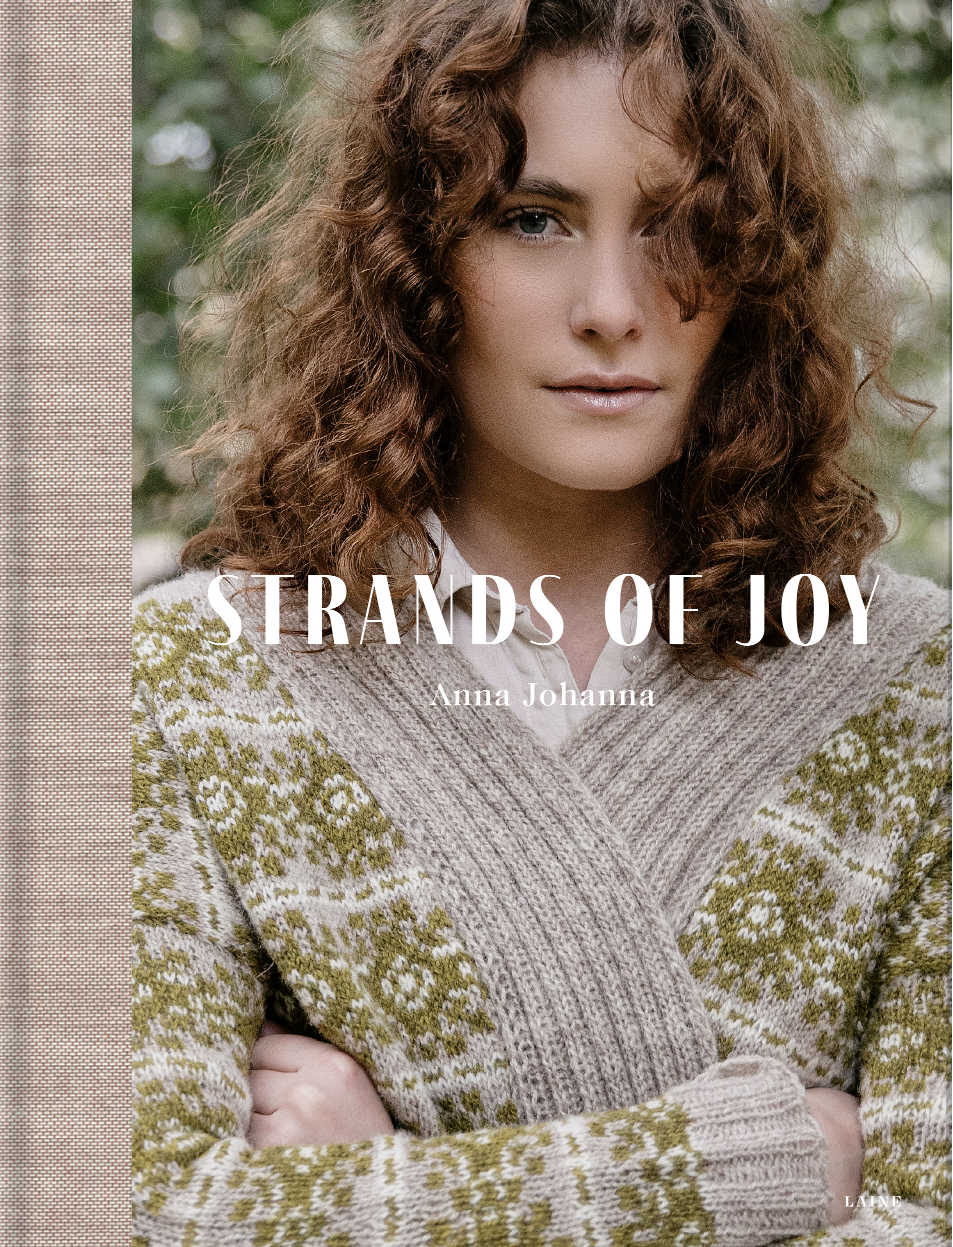 Strands of Joy by Anna Johanna